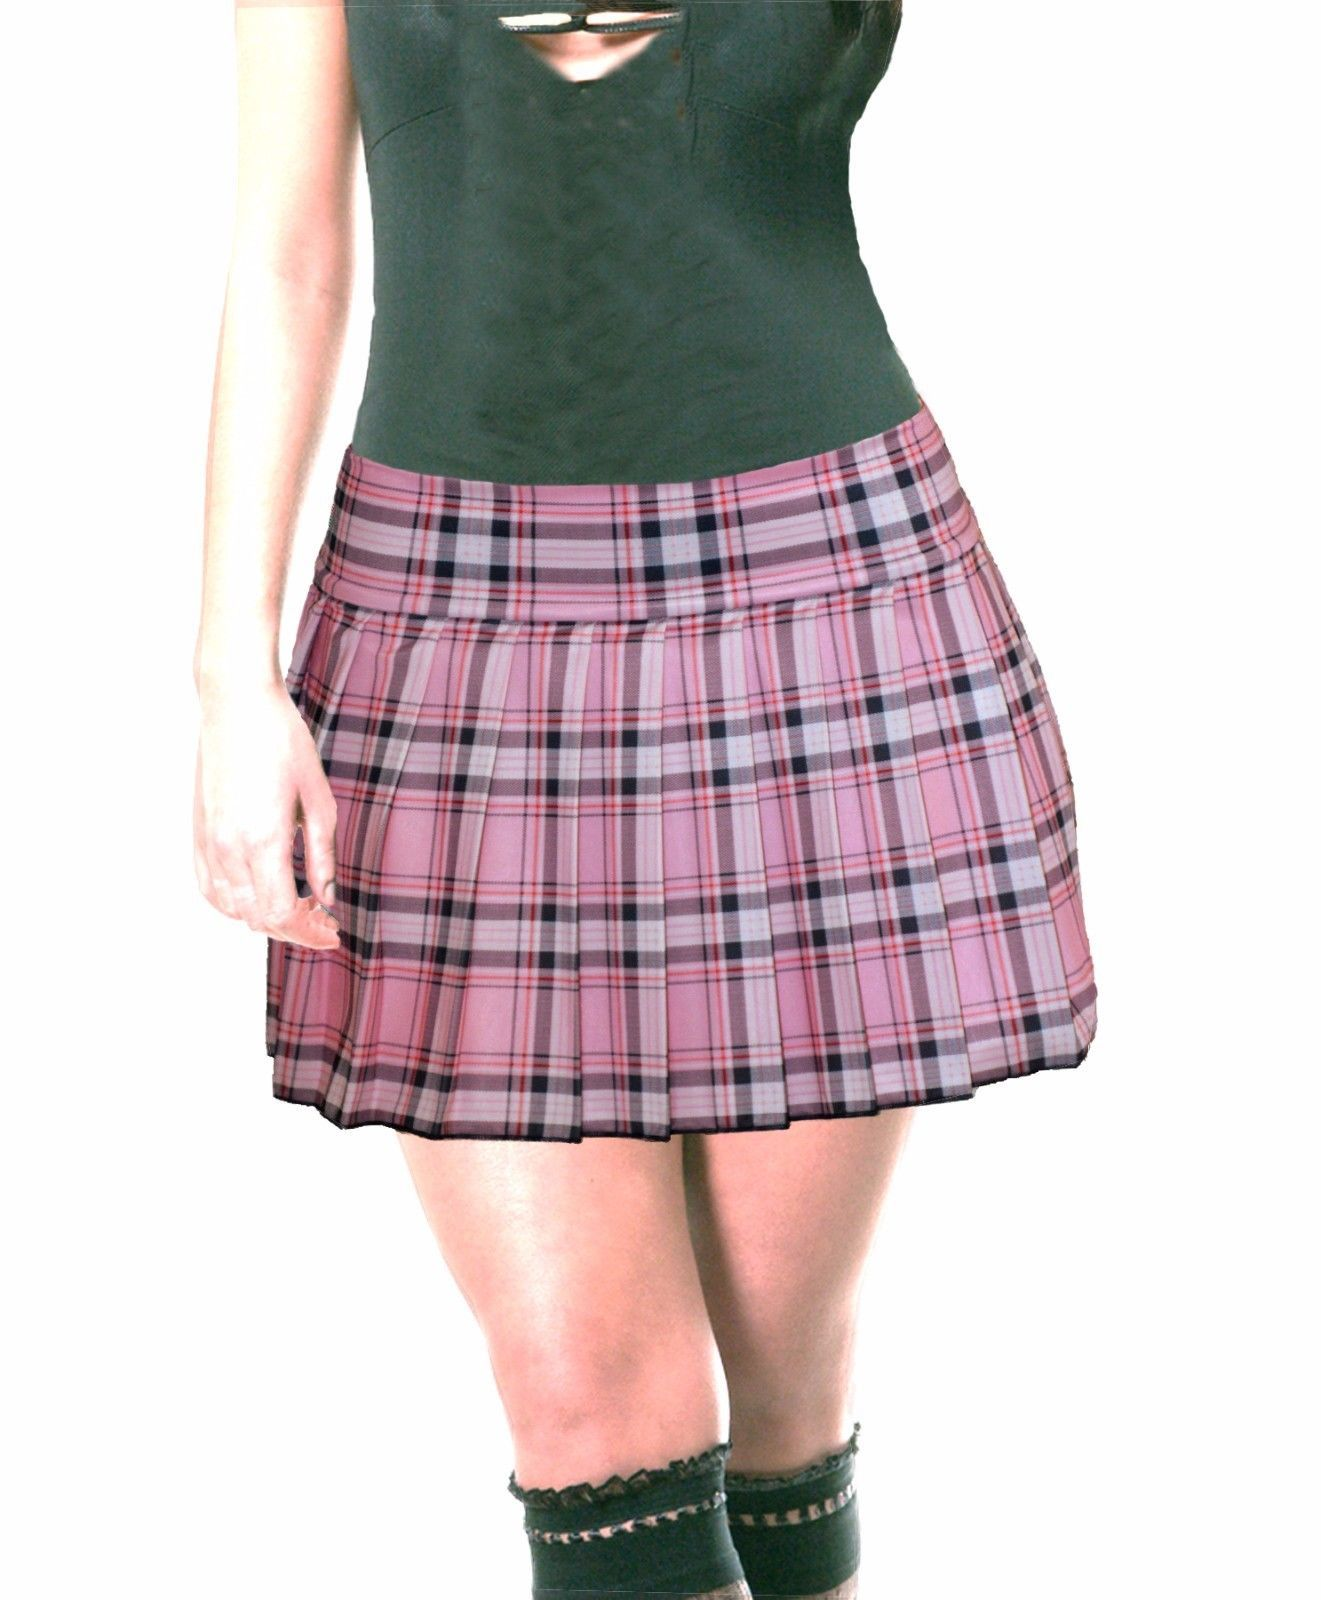 ab340015088 Plus Size Pink Stretch Lycra Schoolgirl Tartan Plaid Pleated Mini Skirt  14